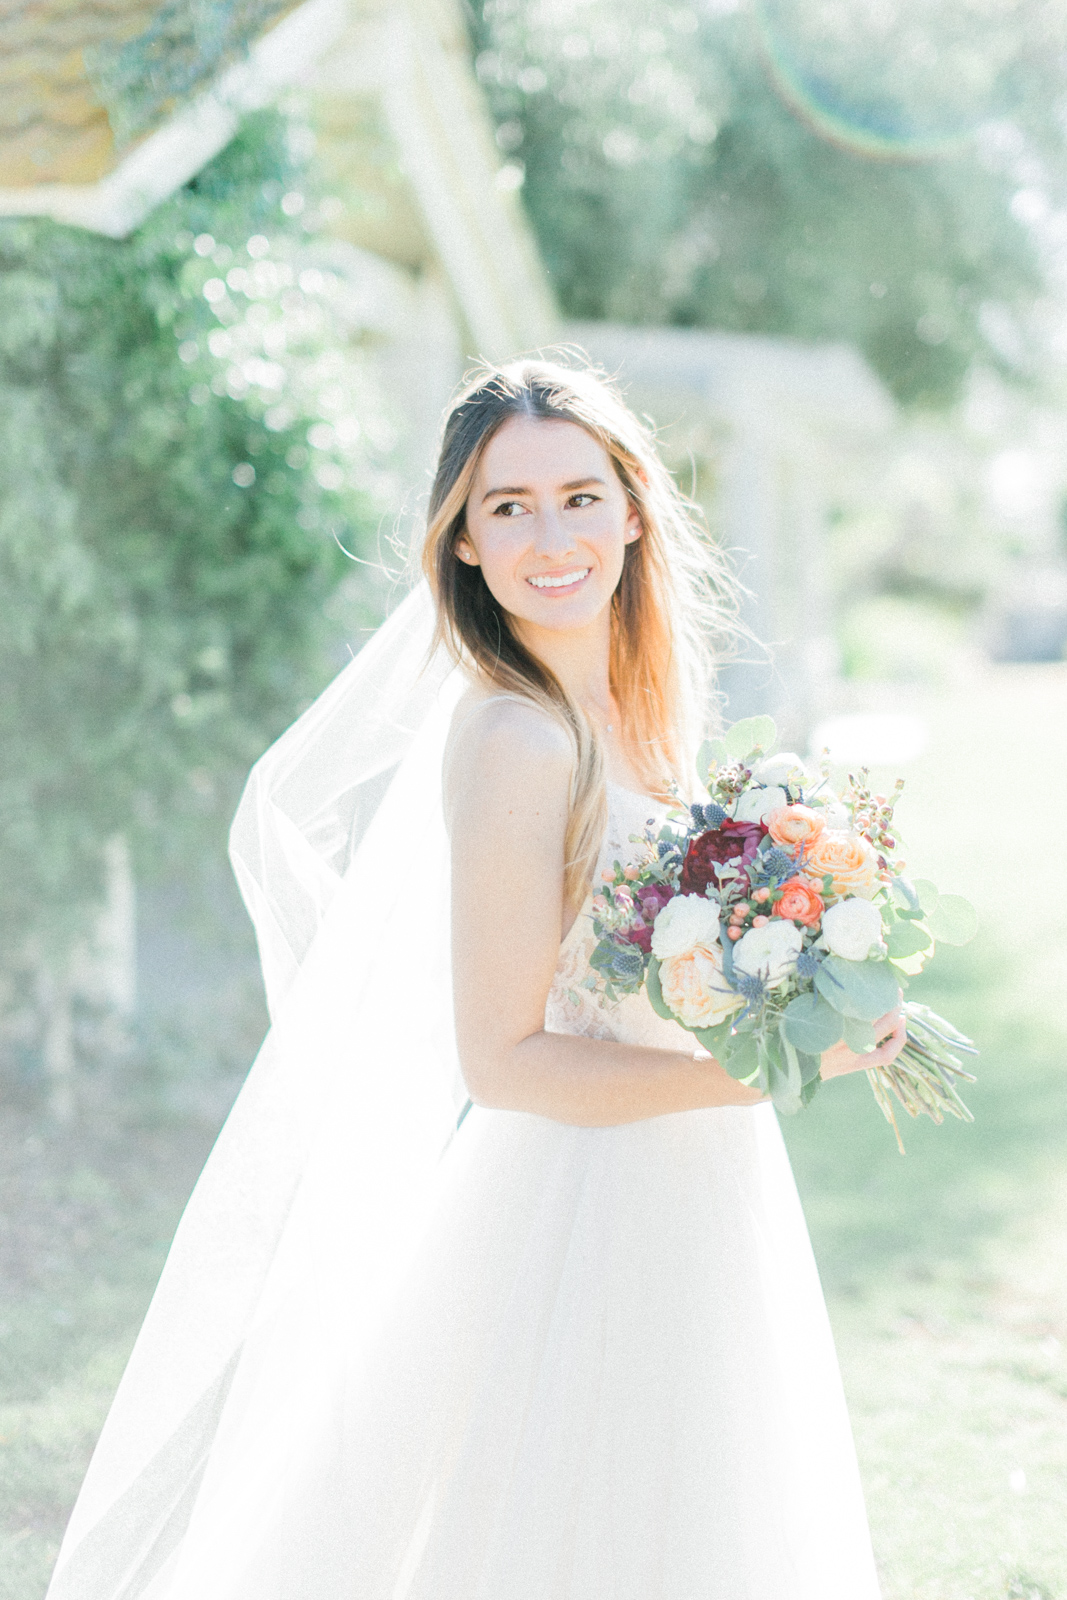 boise-idaho-elopement-engagement-photographer-9319.jpg